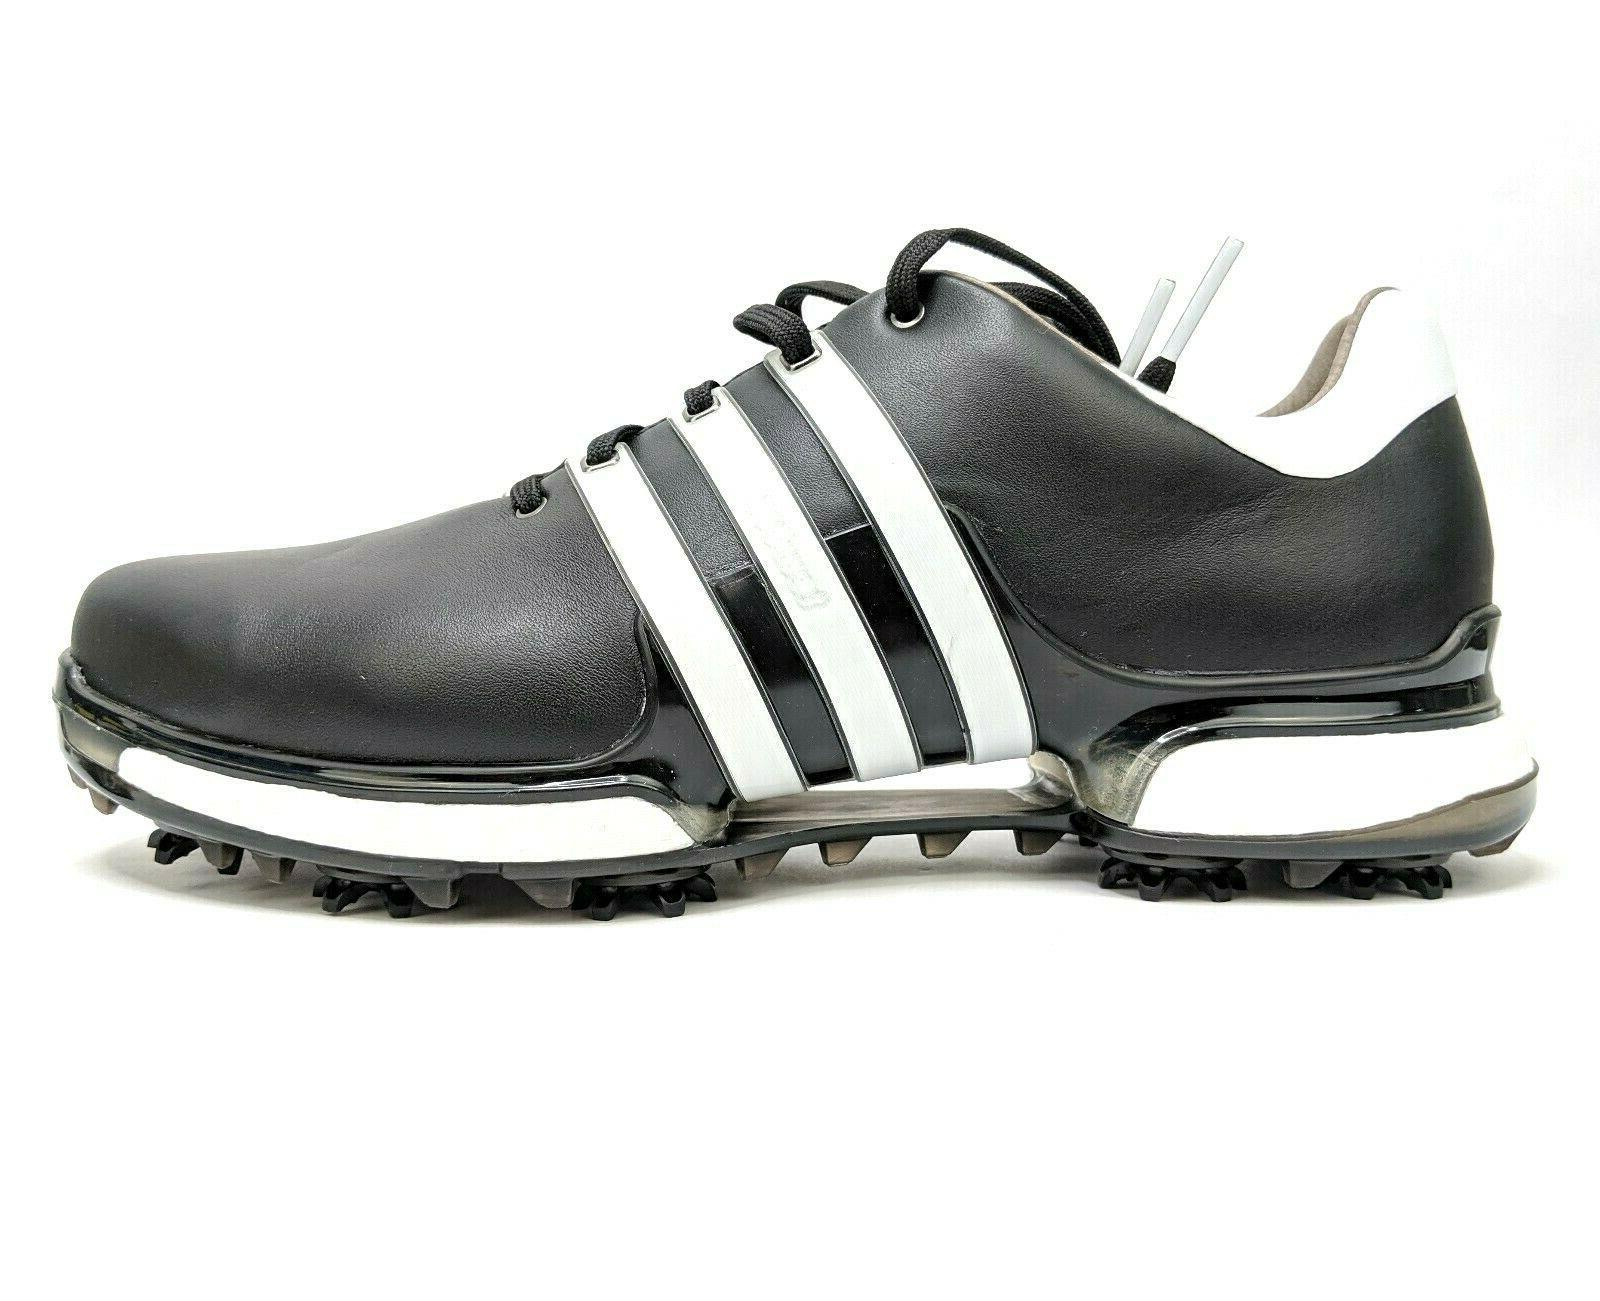 Adidas 360 2.0 Mens Wide Black Golf Boost